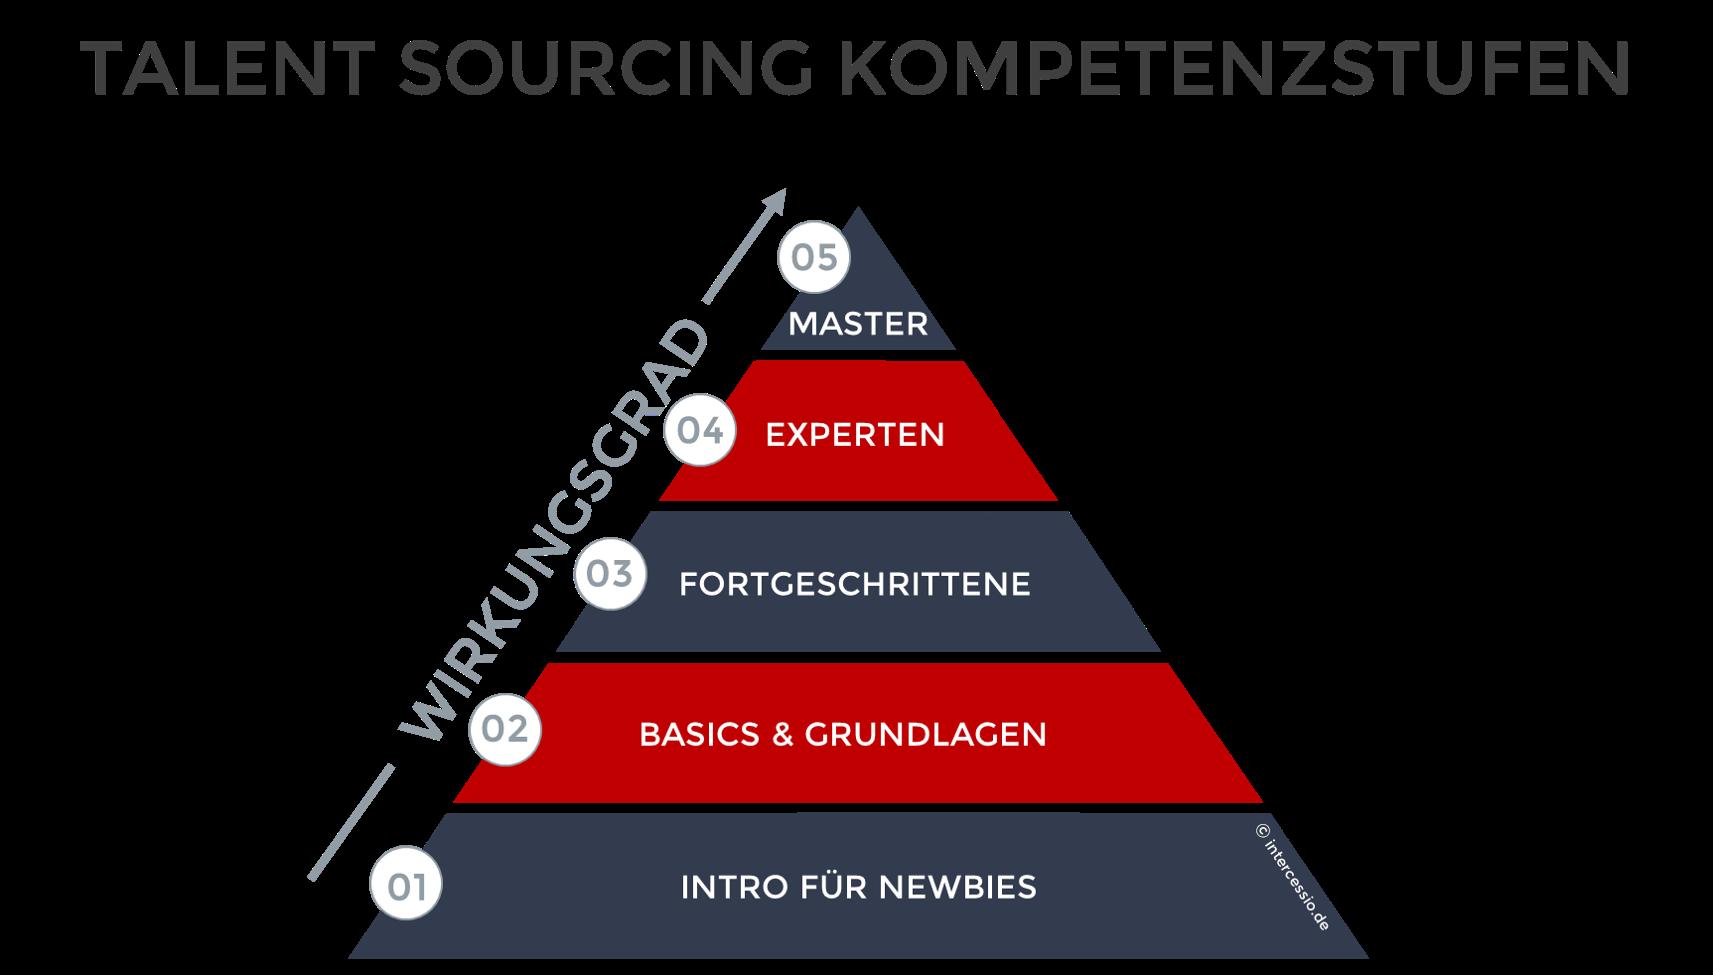 Talent Sourcing Kompetenzstufen by Intercessio Academy - Active Sourcing Erfolg